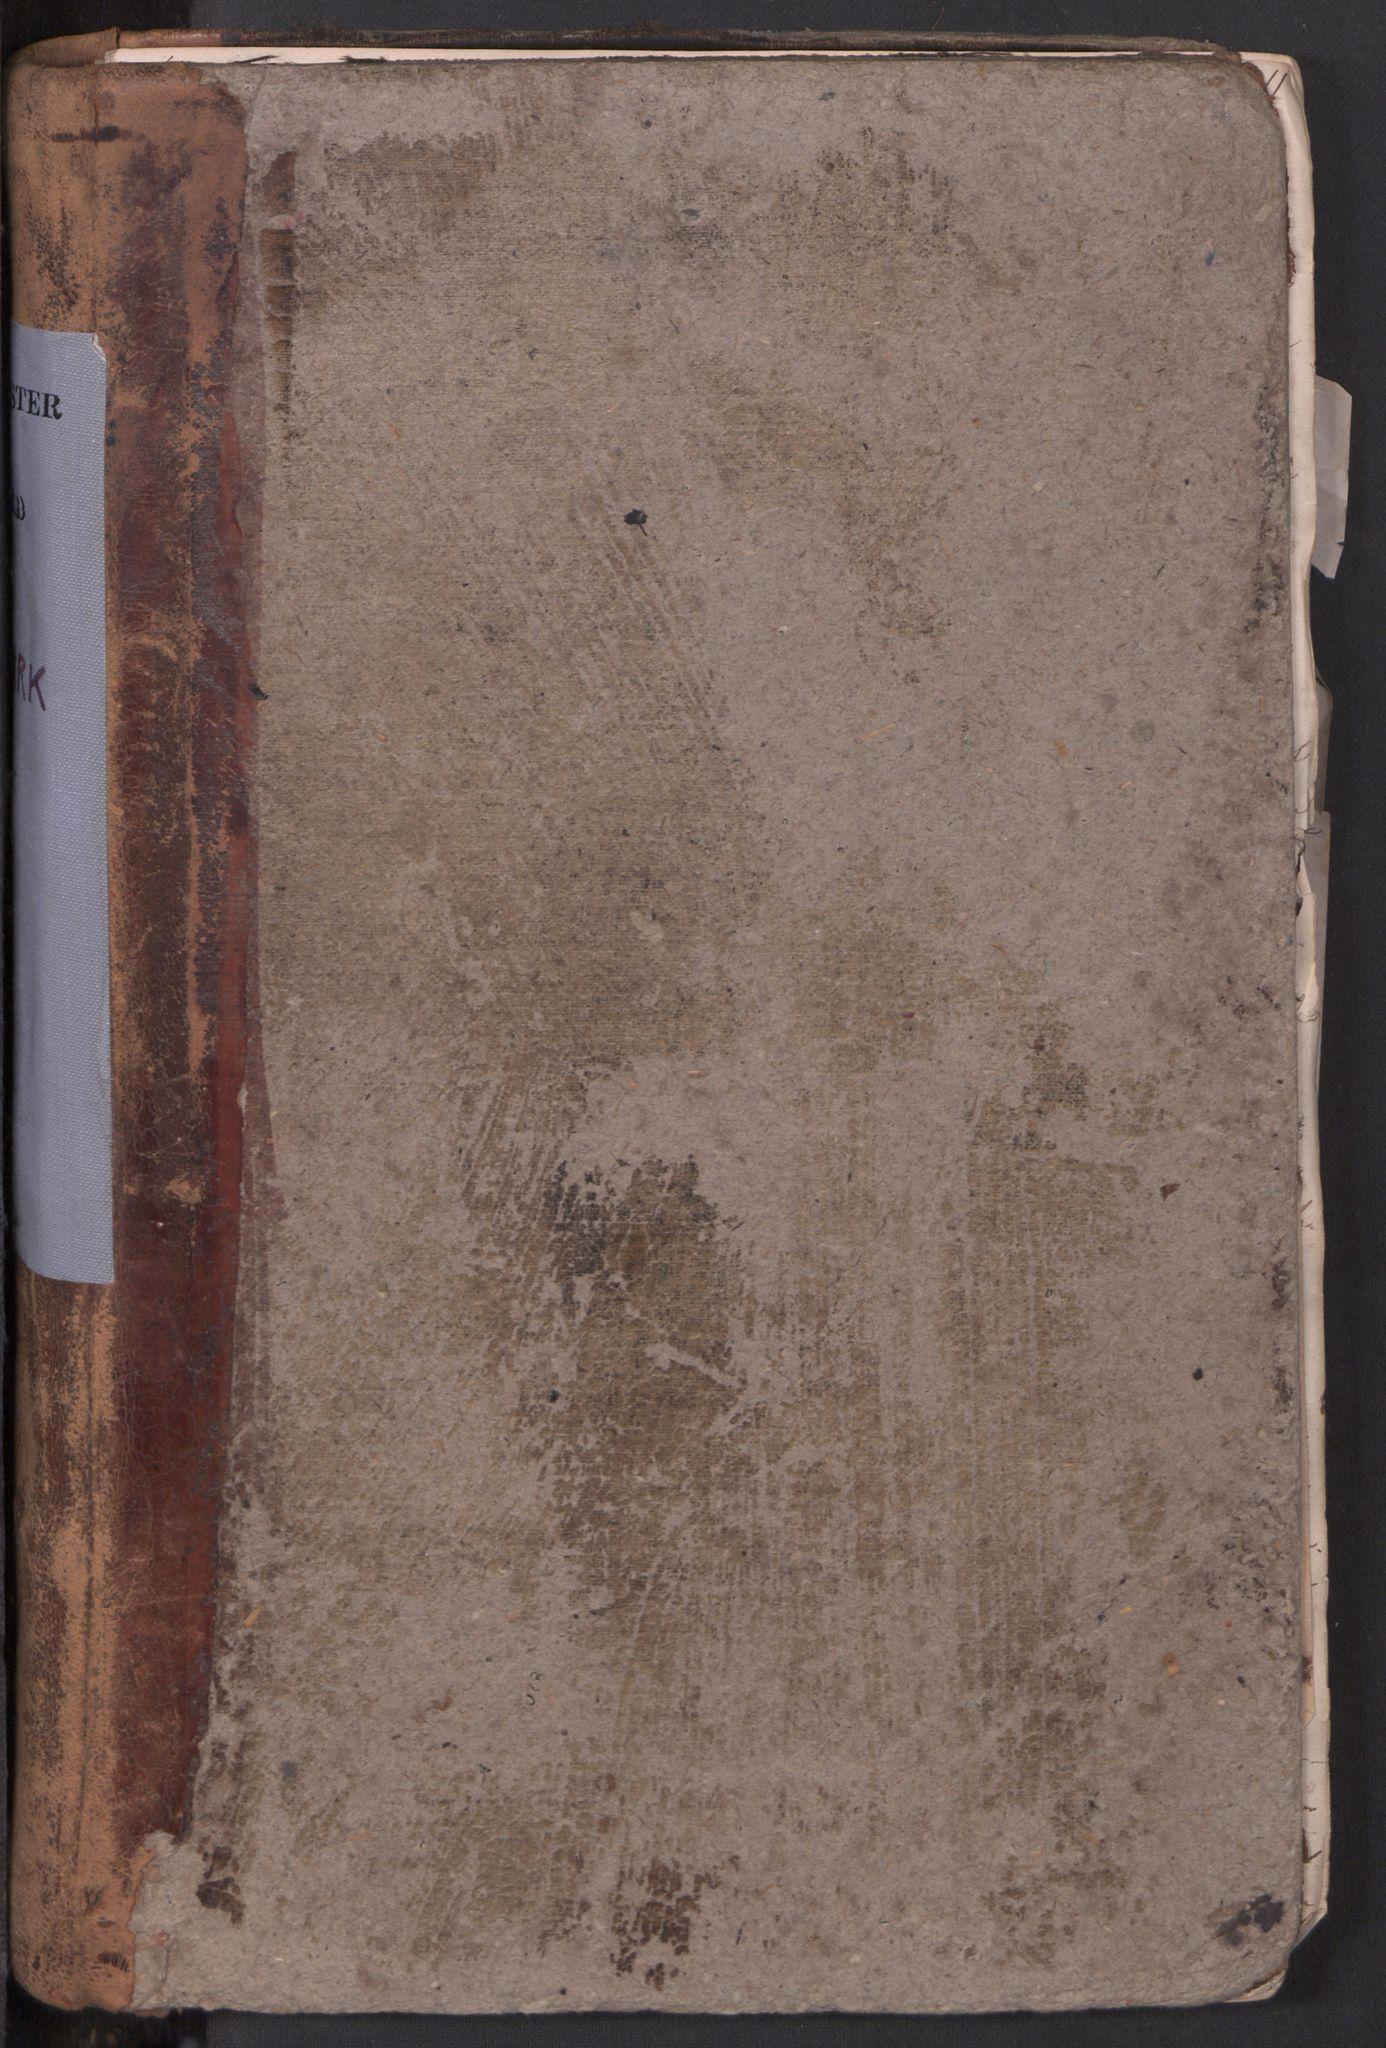 SAO, Norges brannkasse, branntakster Aremark, F/Fa/L0001: Branntakstprotokoll I, 1846-1880